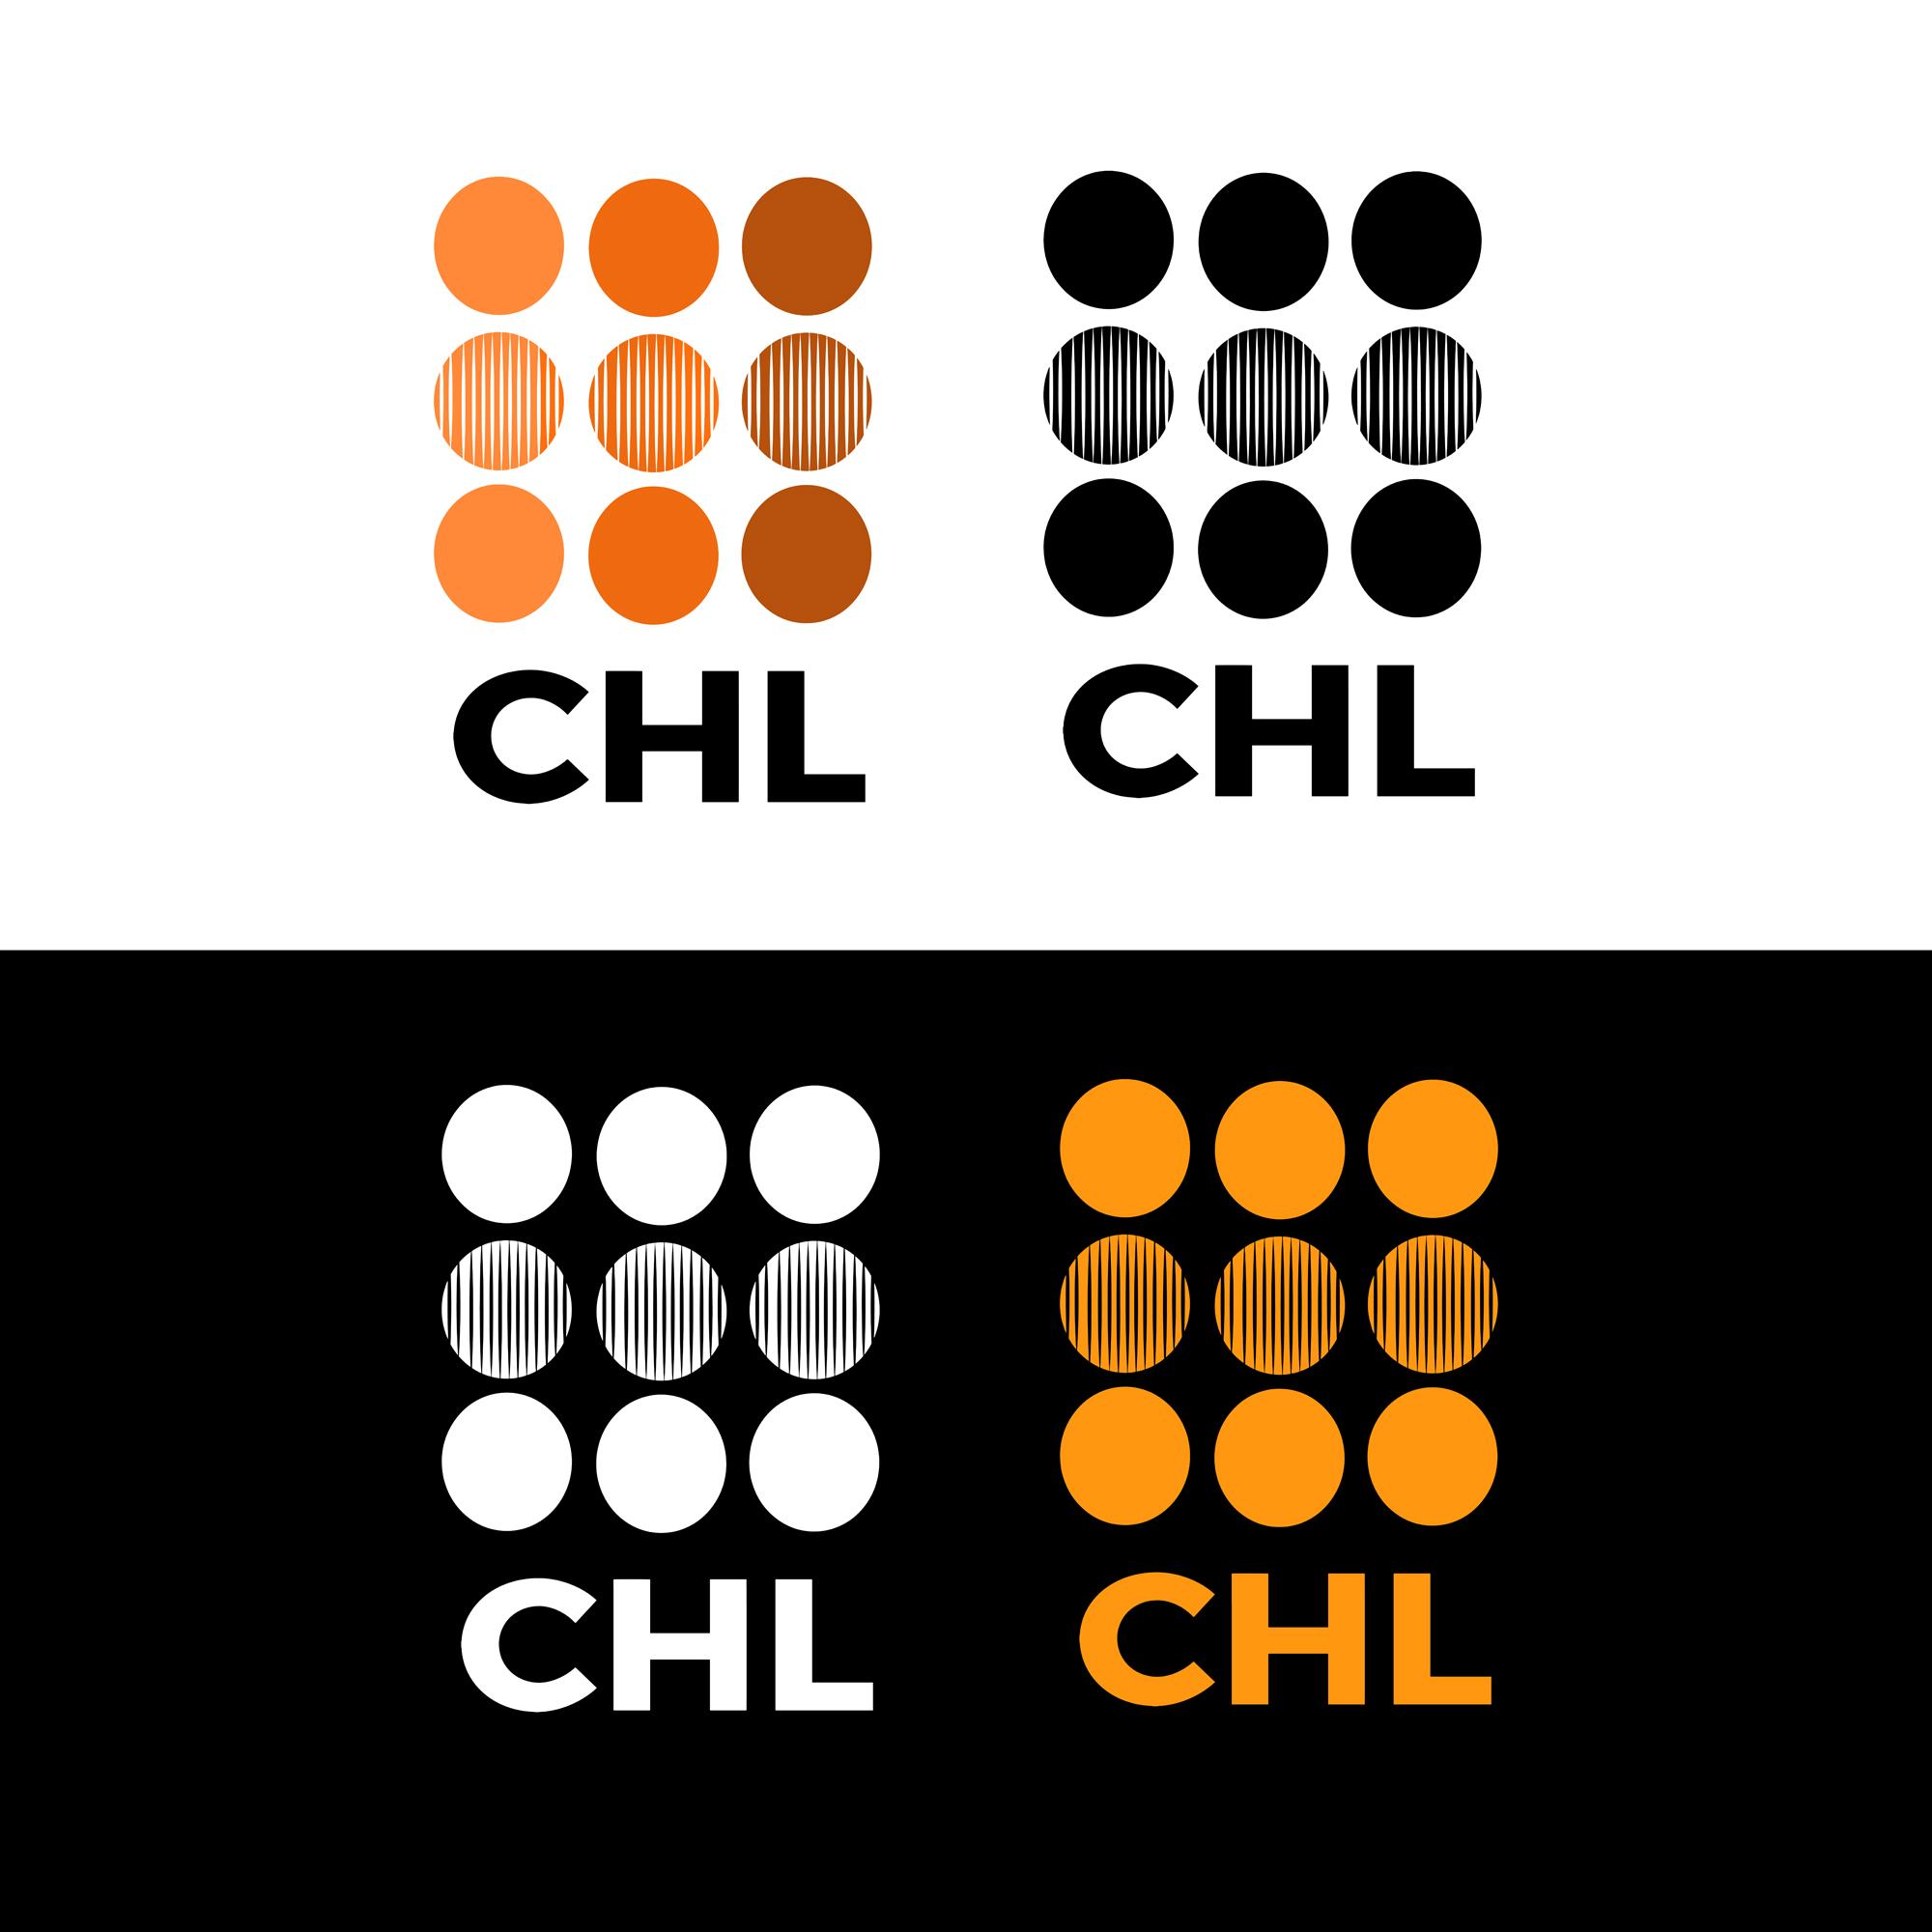 разработка логотипа для производителя фар фото f_2145f5a1fc5be90b.jpg